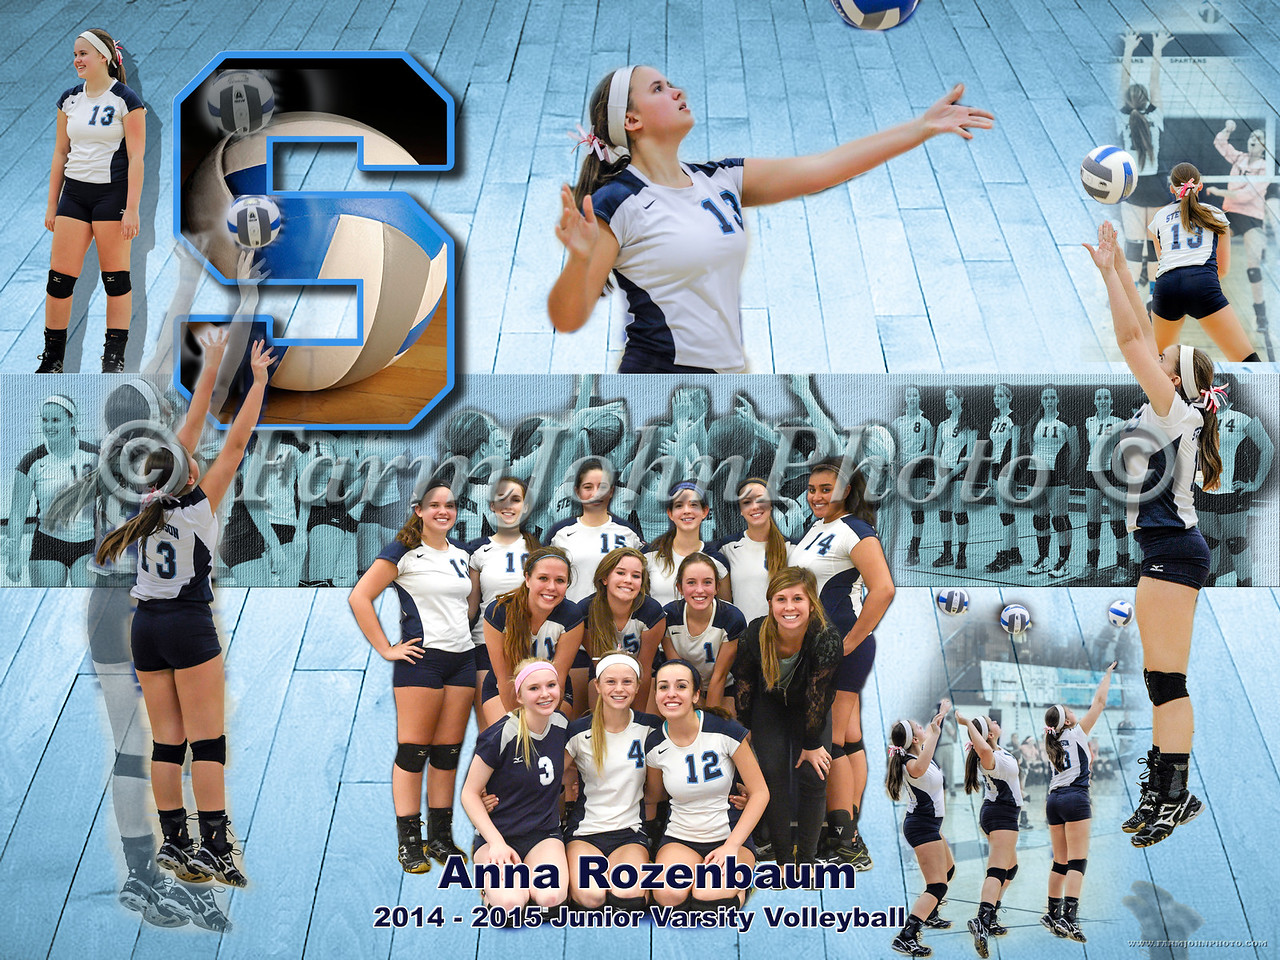 Anna Rozenbaum 24 x 18 Format Proof 2